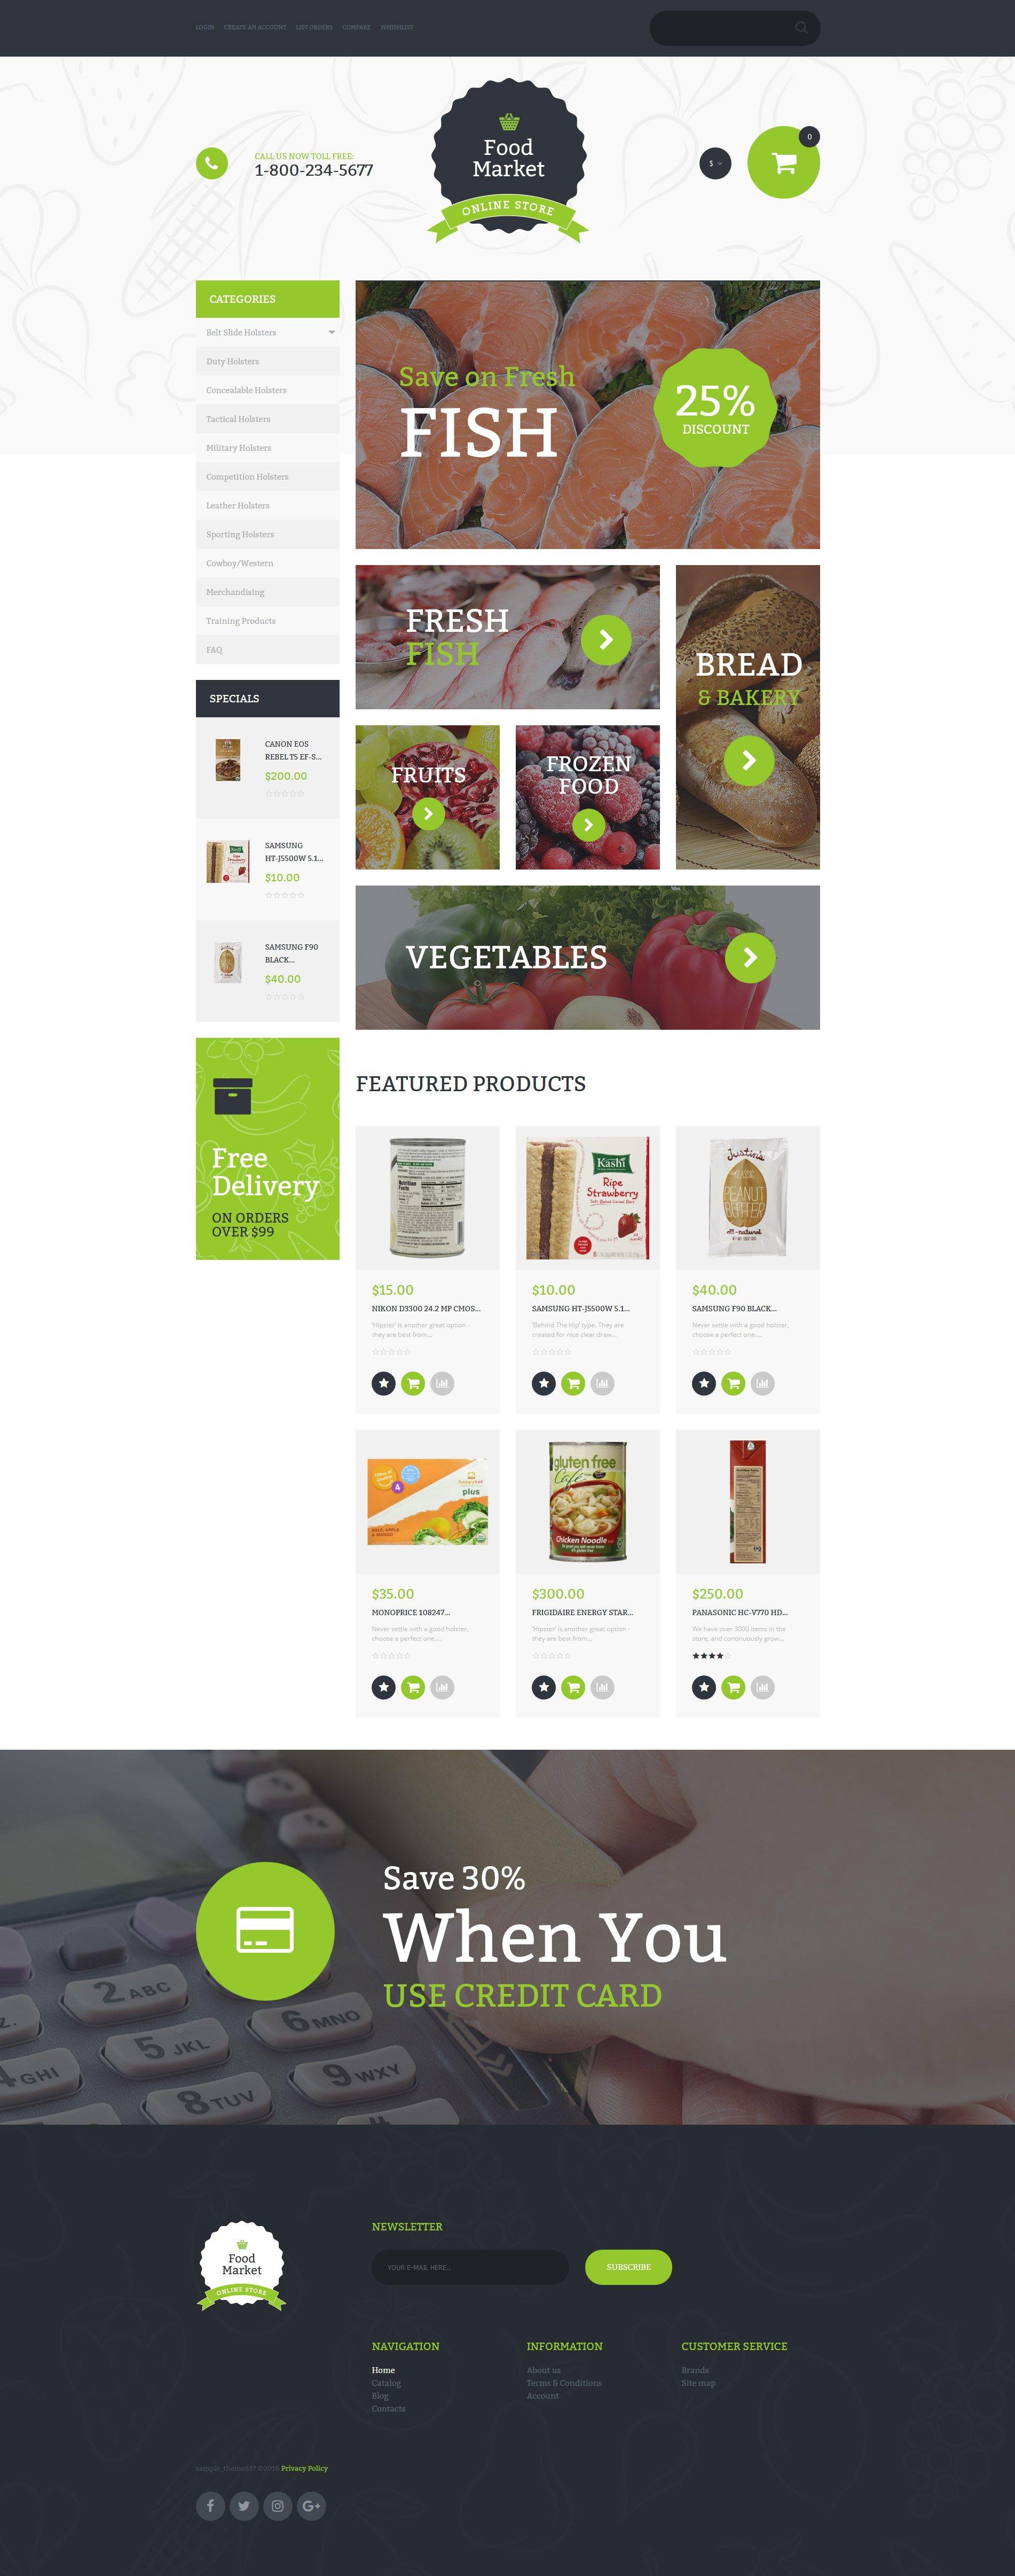 Food Market №58876 - скриншот